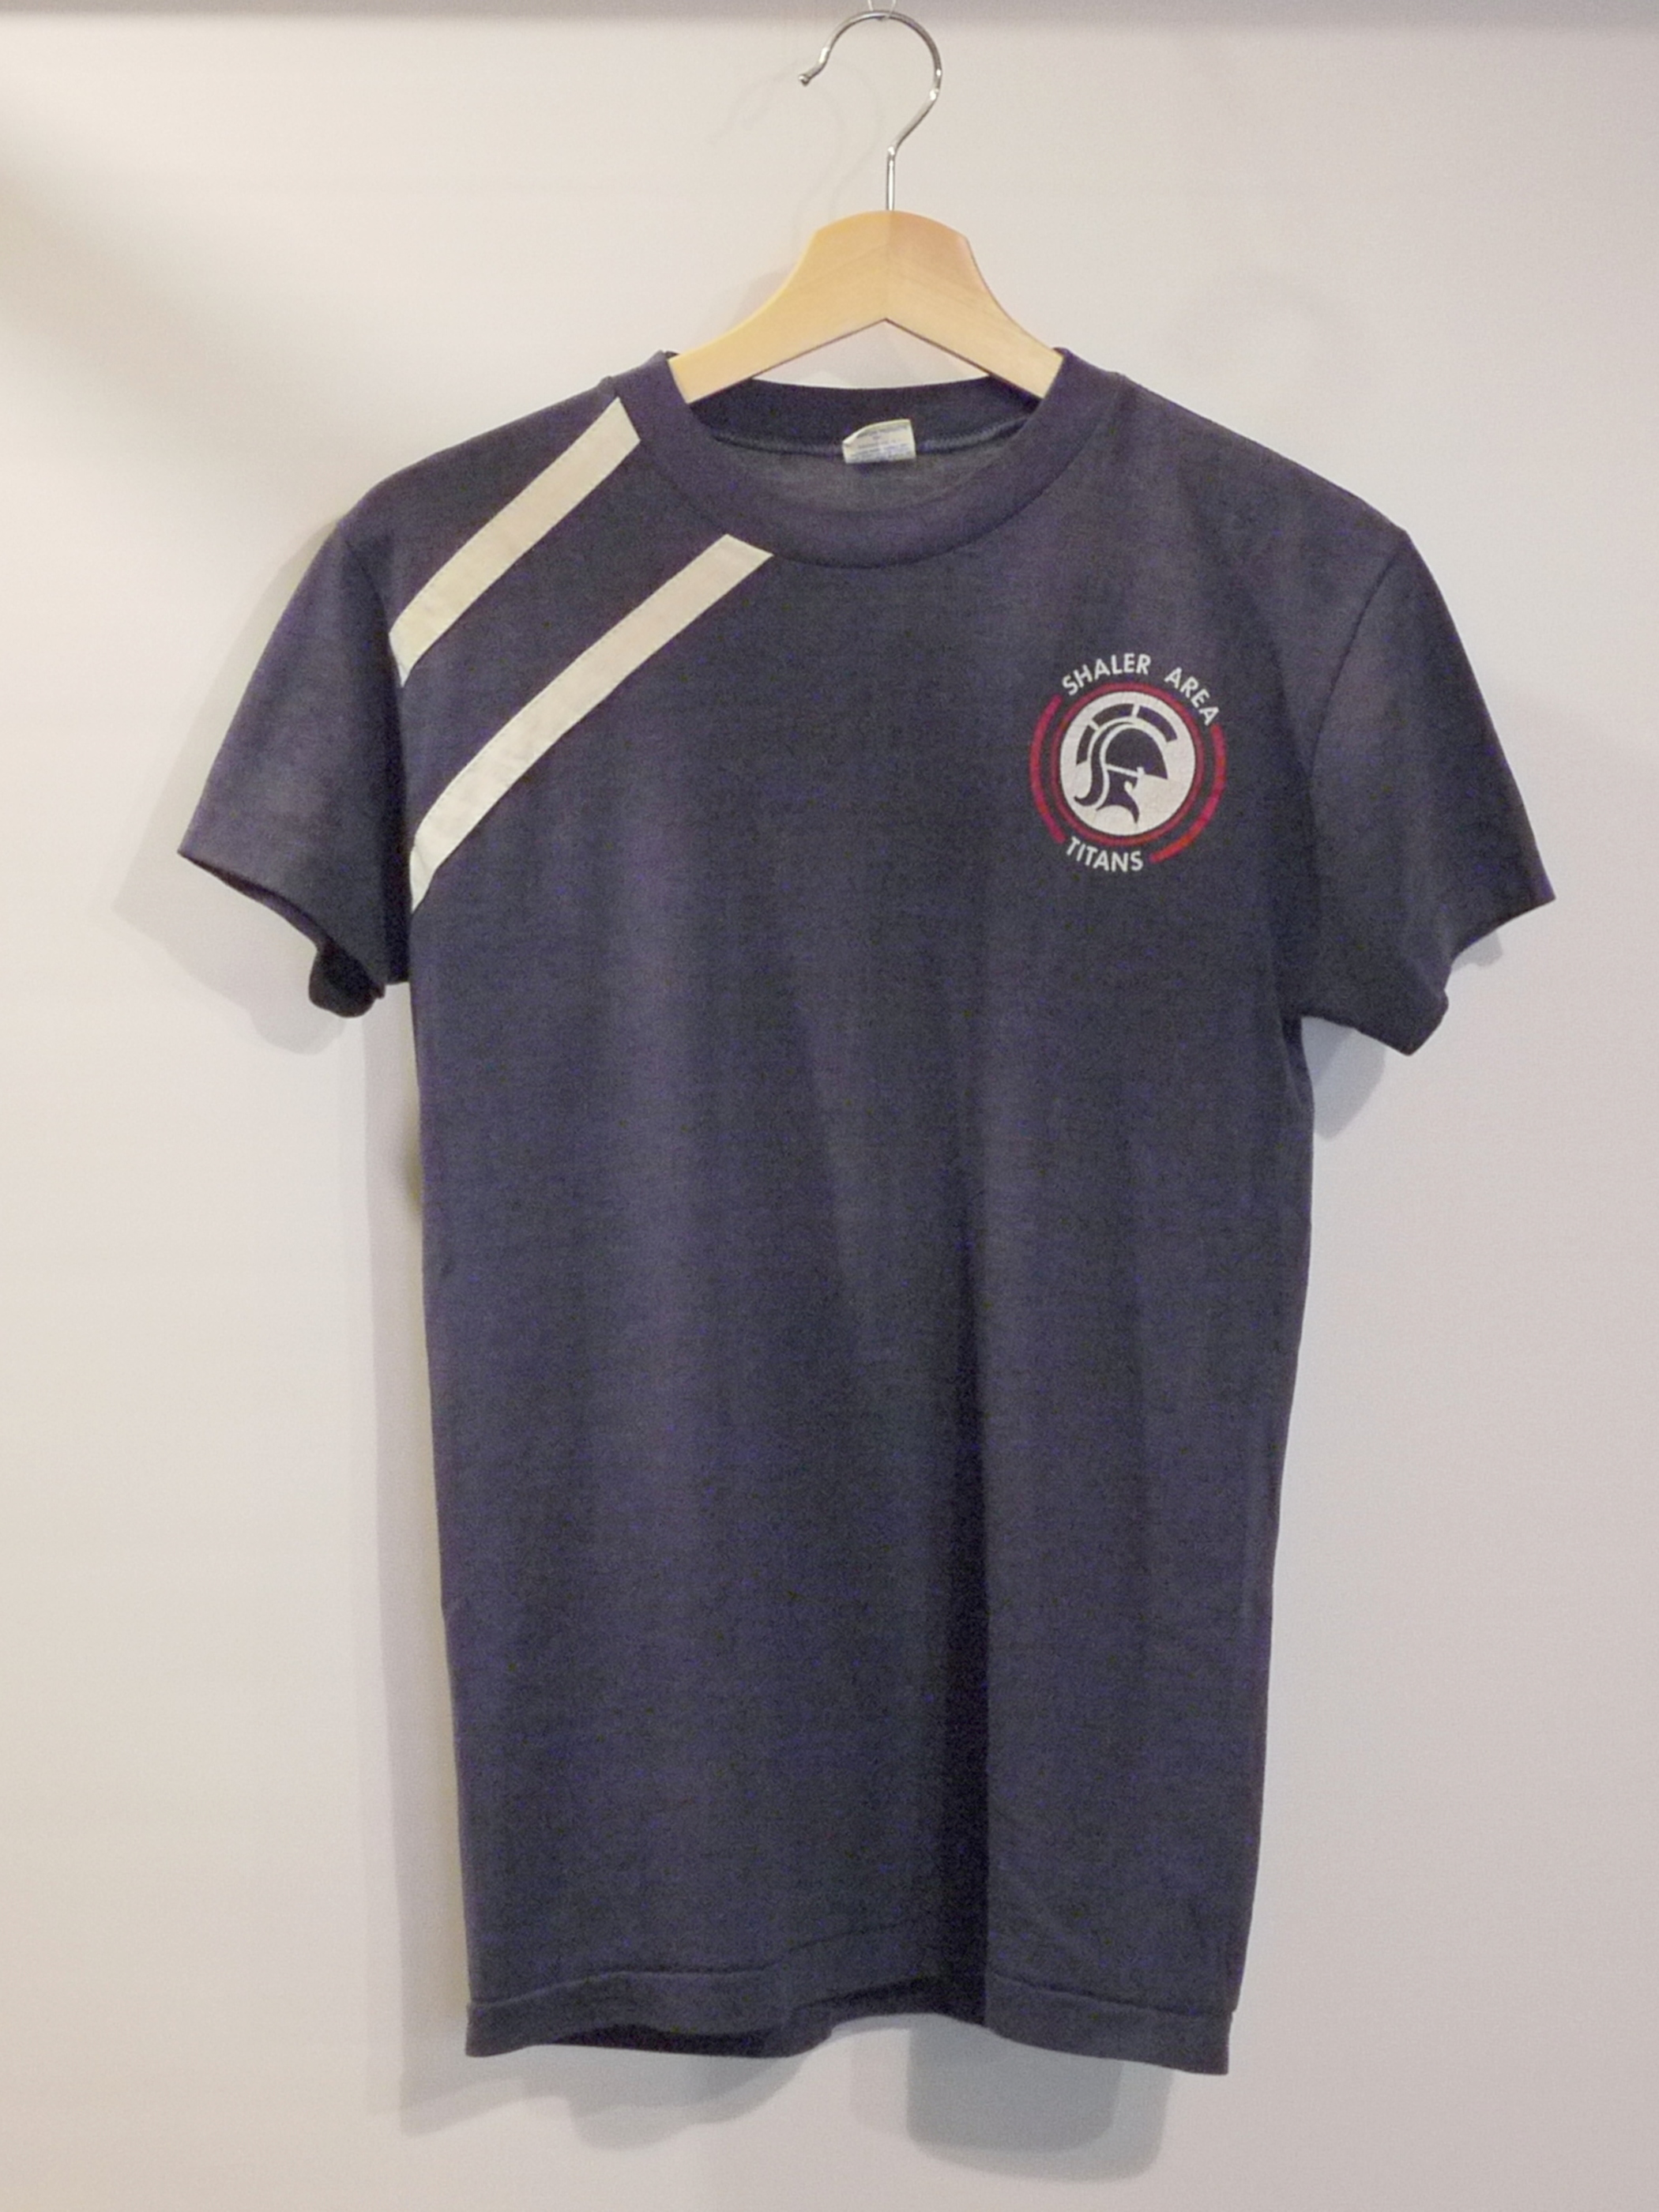 "Champion 1970's T-Shirts SizeM ""SHALER AREA TITANS"""